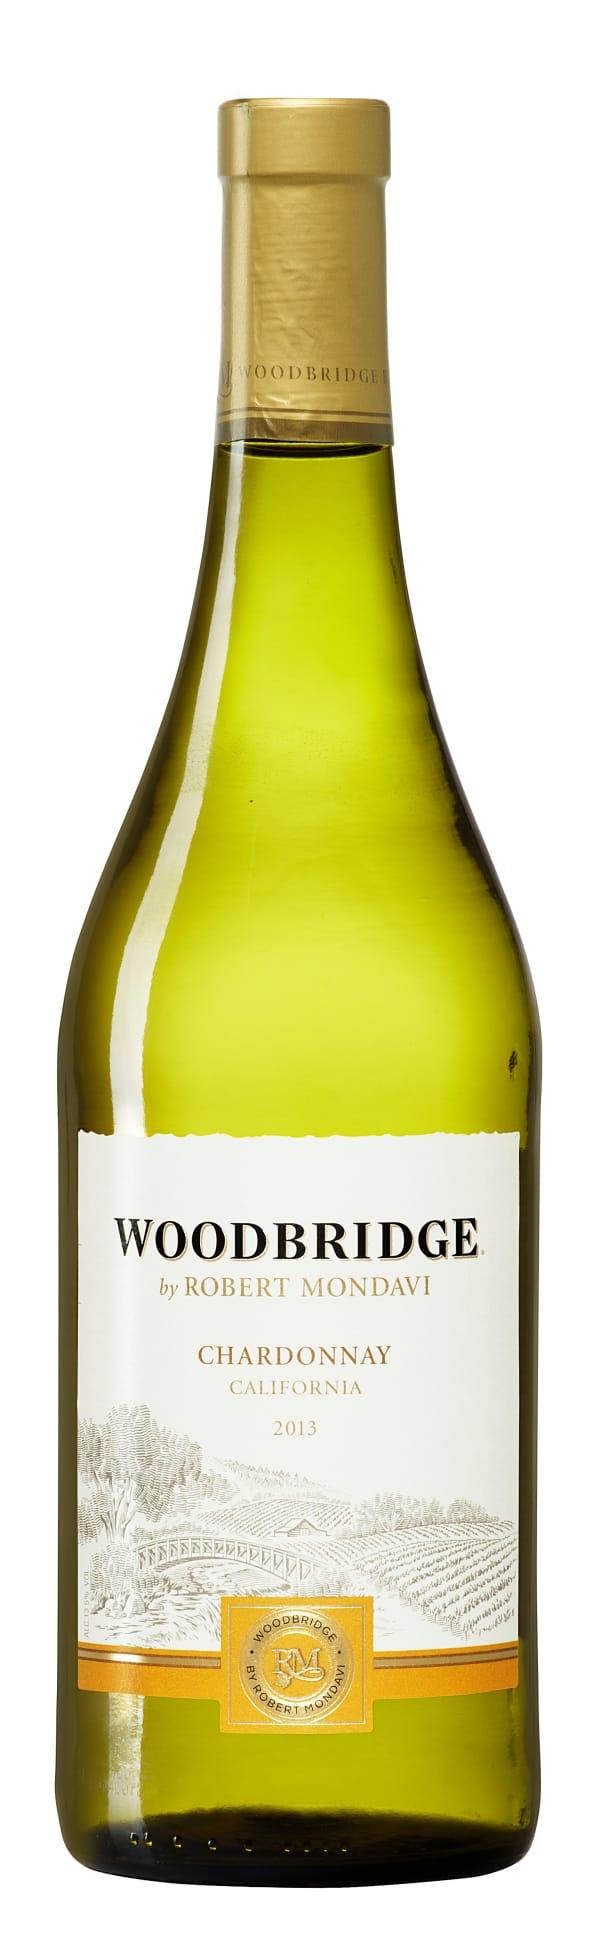 Robert Mondavi Woodbridge Chardonnay 2017